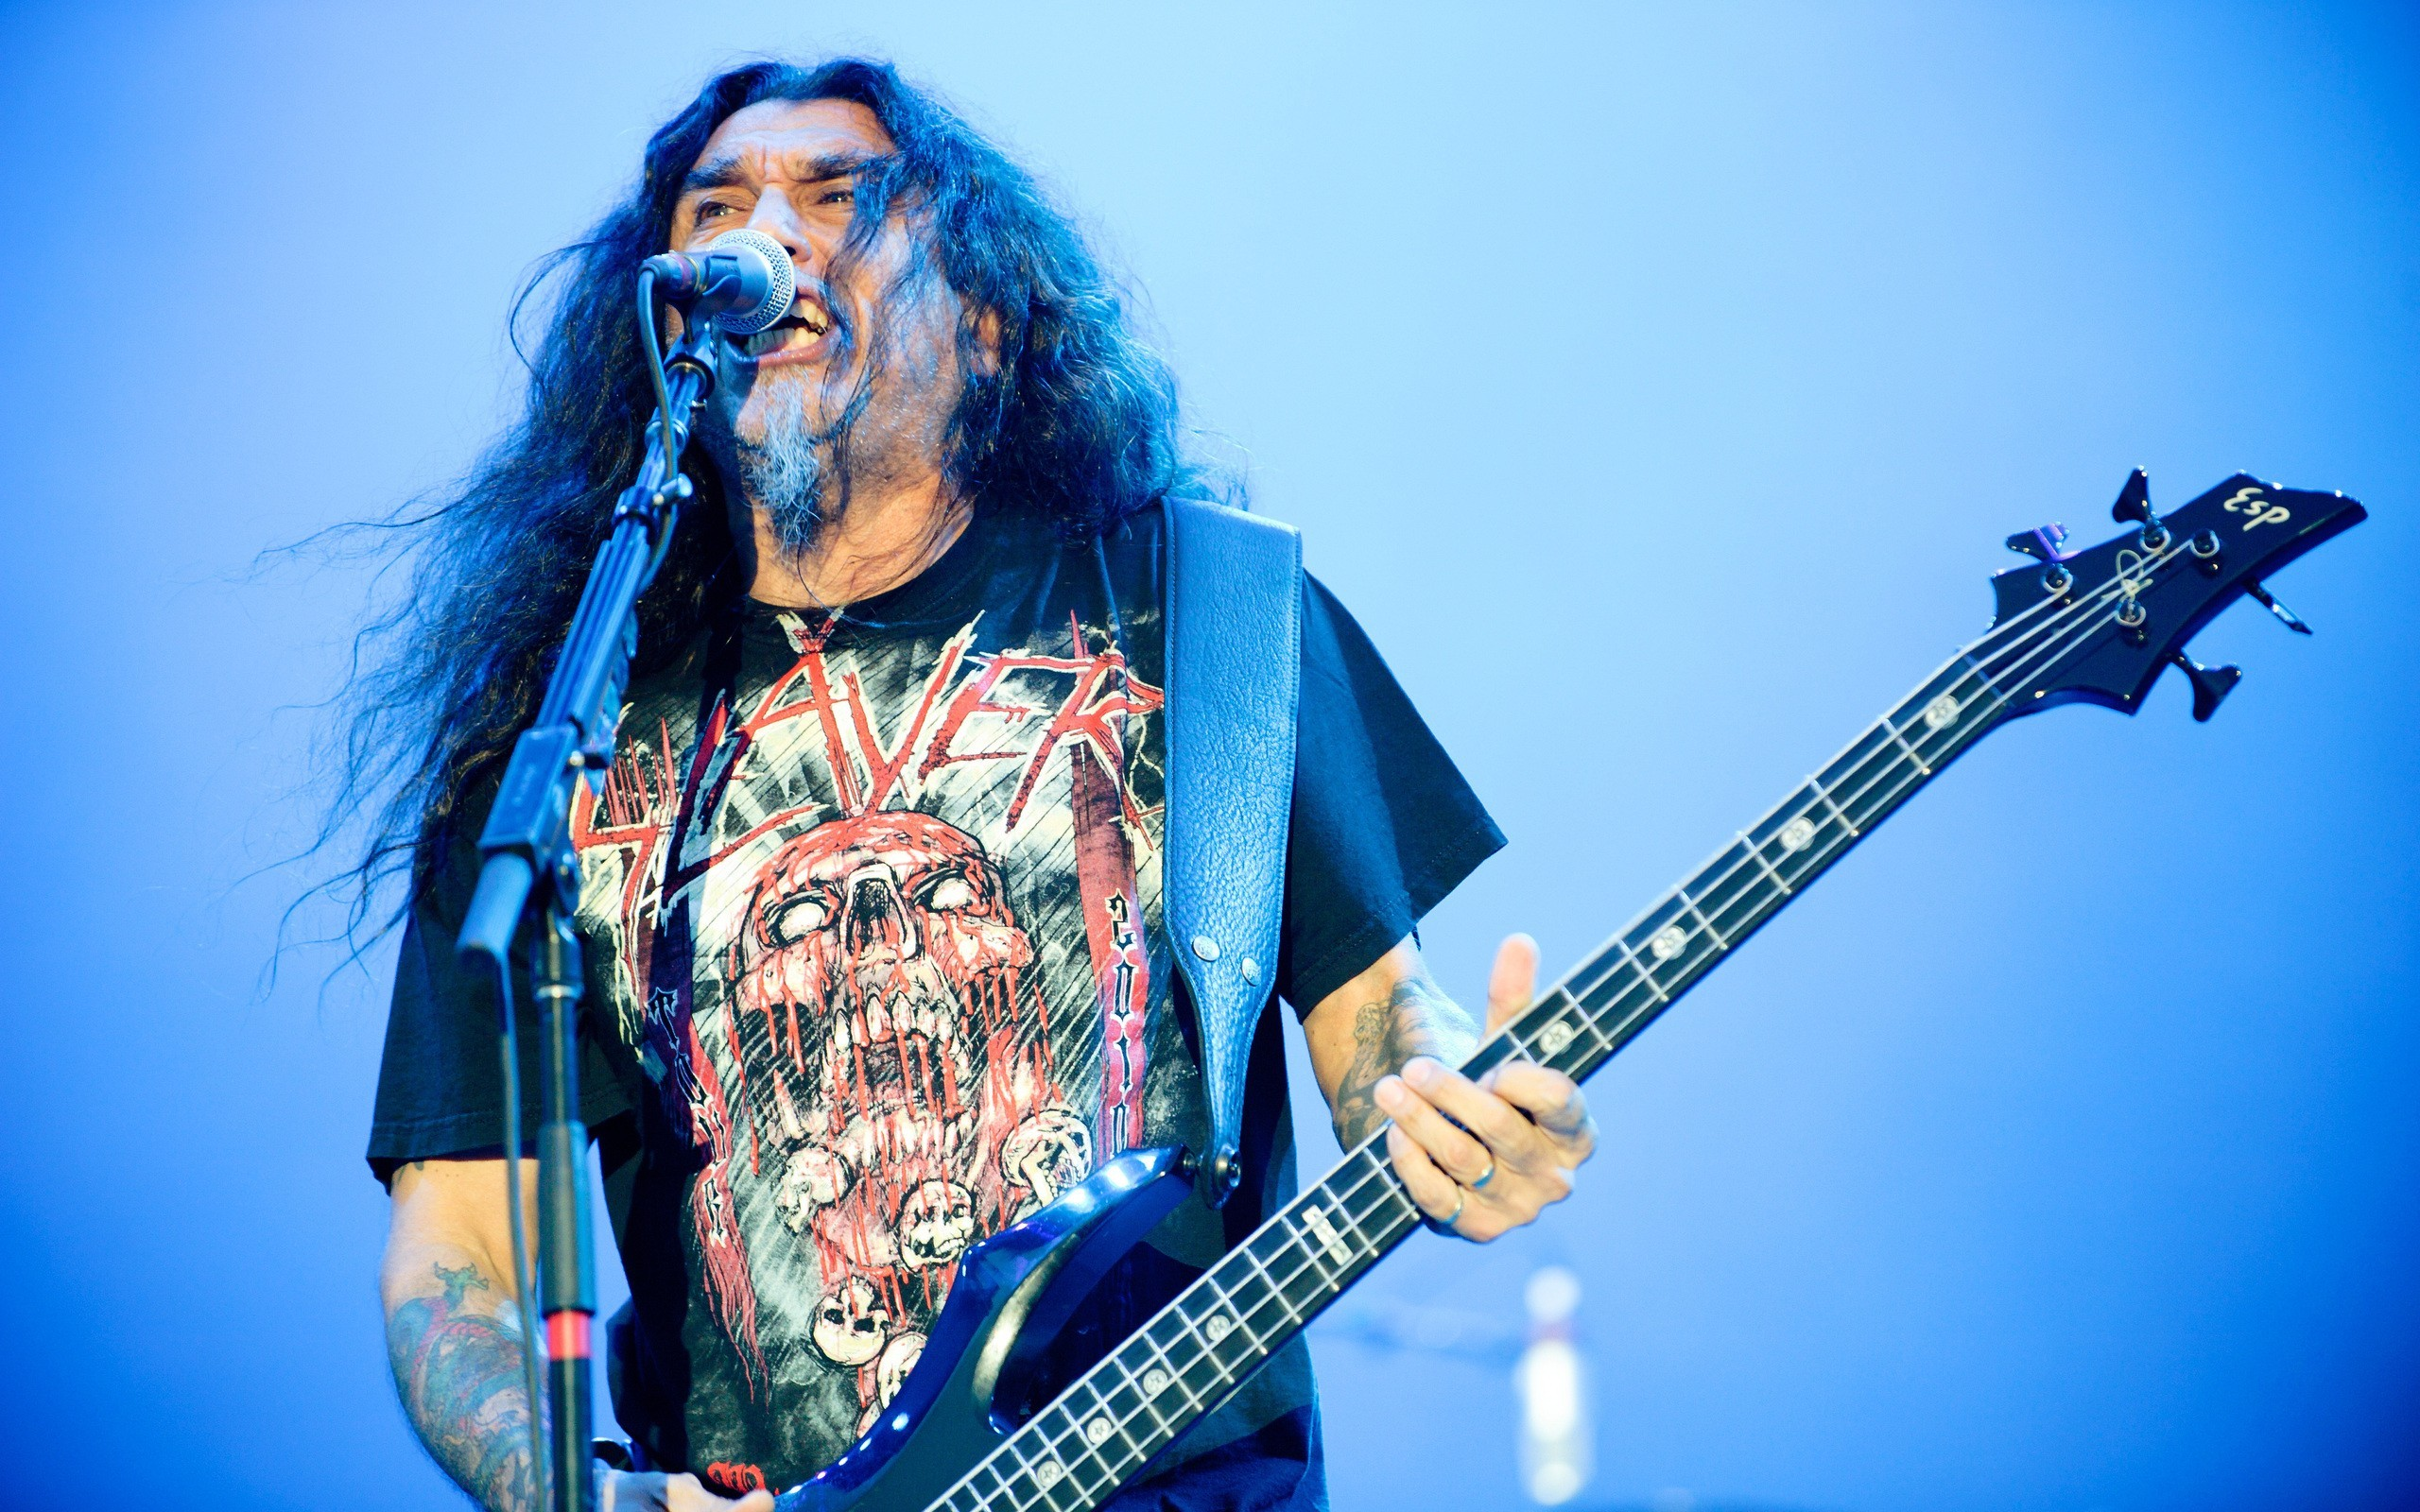 People 2560x1600 thrash metal metal band band bass guitars singer microphone alternative subculture heavy metal guitarist music concerts electric guitar Tom Araya Slayer